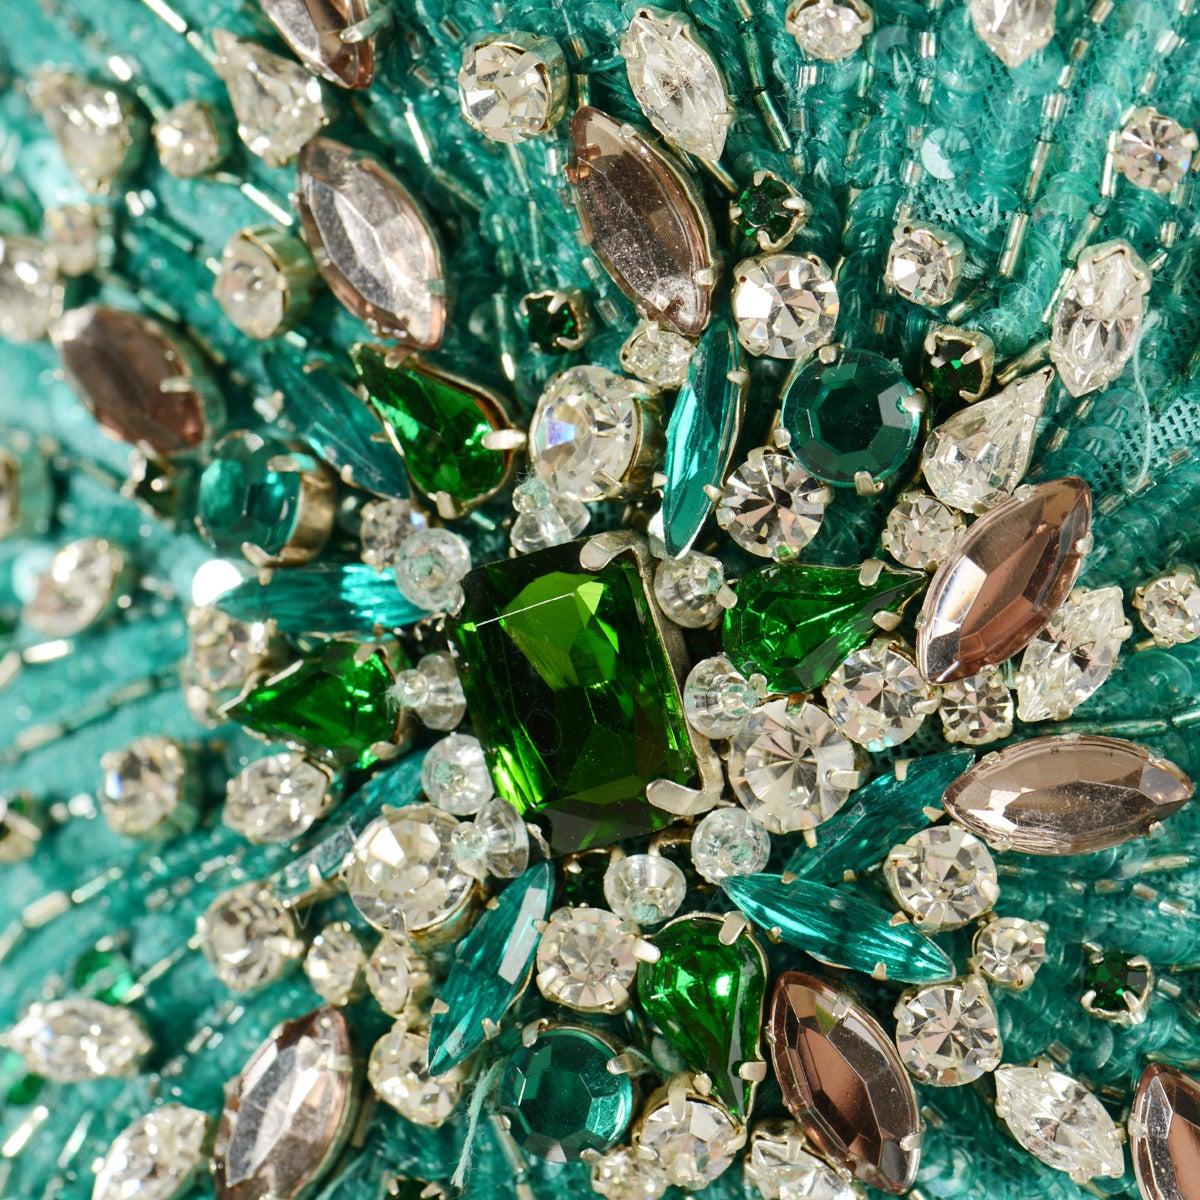 Roberto Cavalli Aqua Green Embroidered Silk Cocktail Dress 3